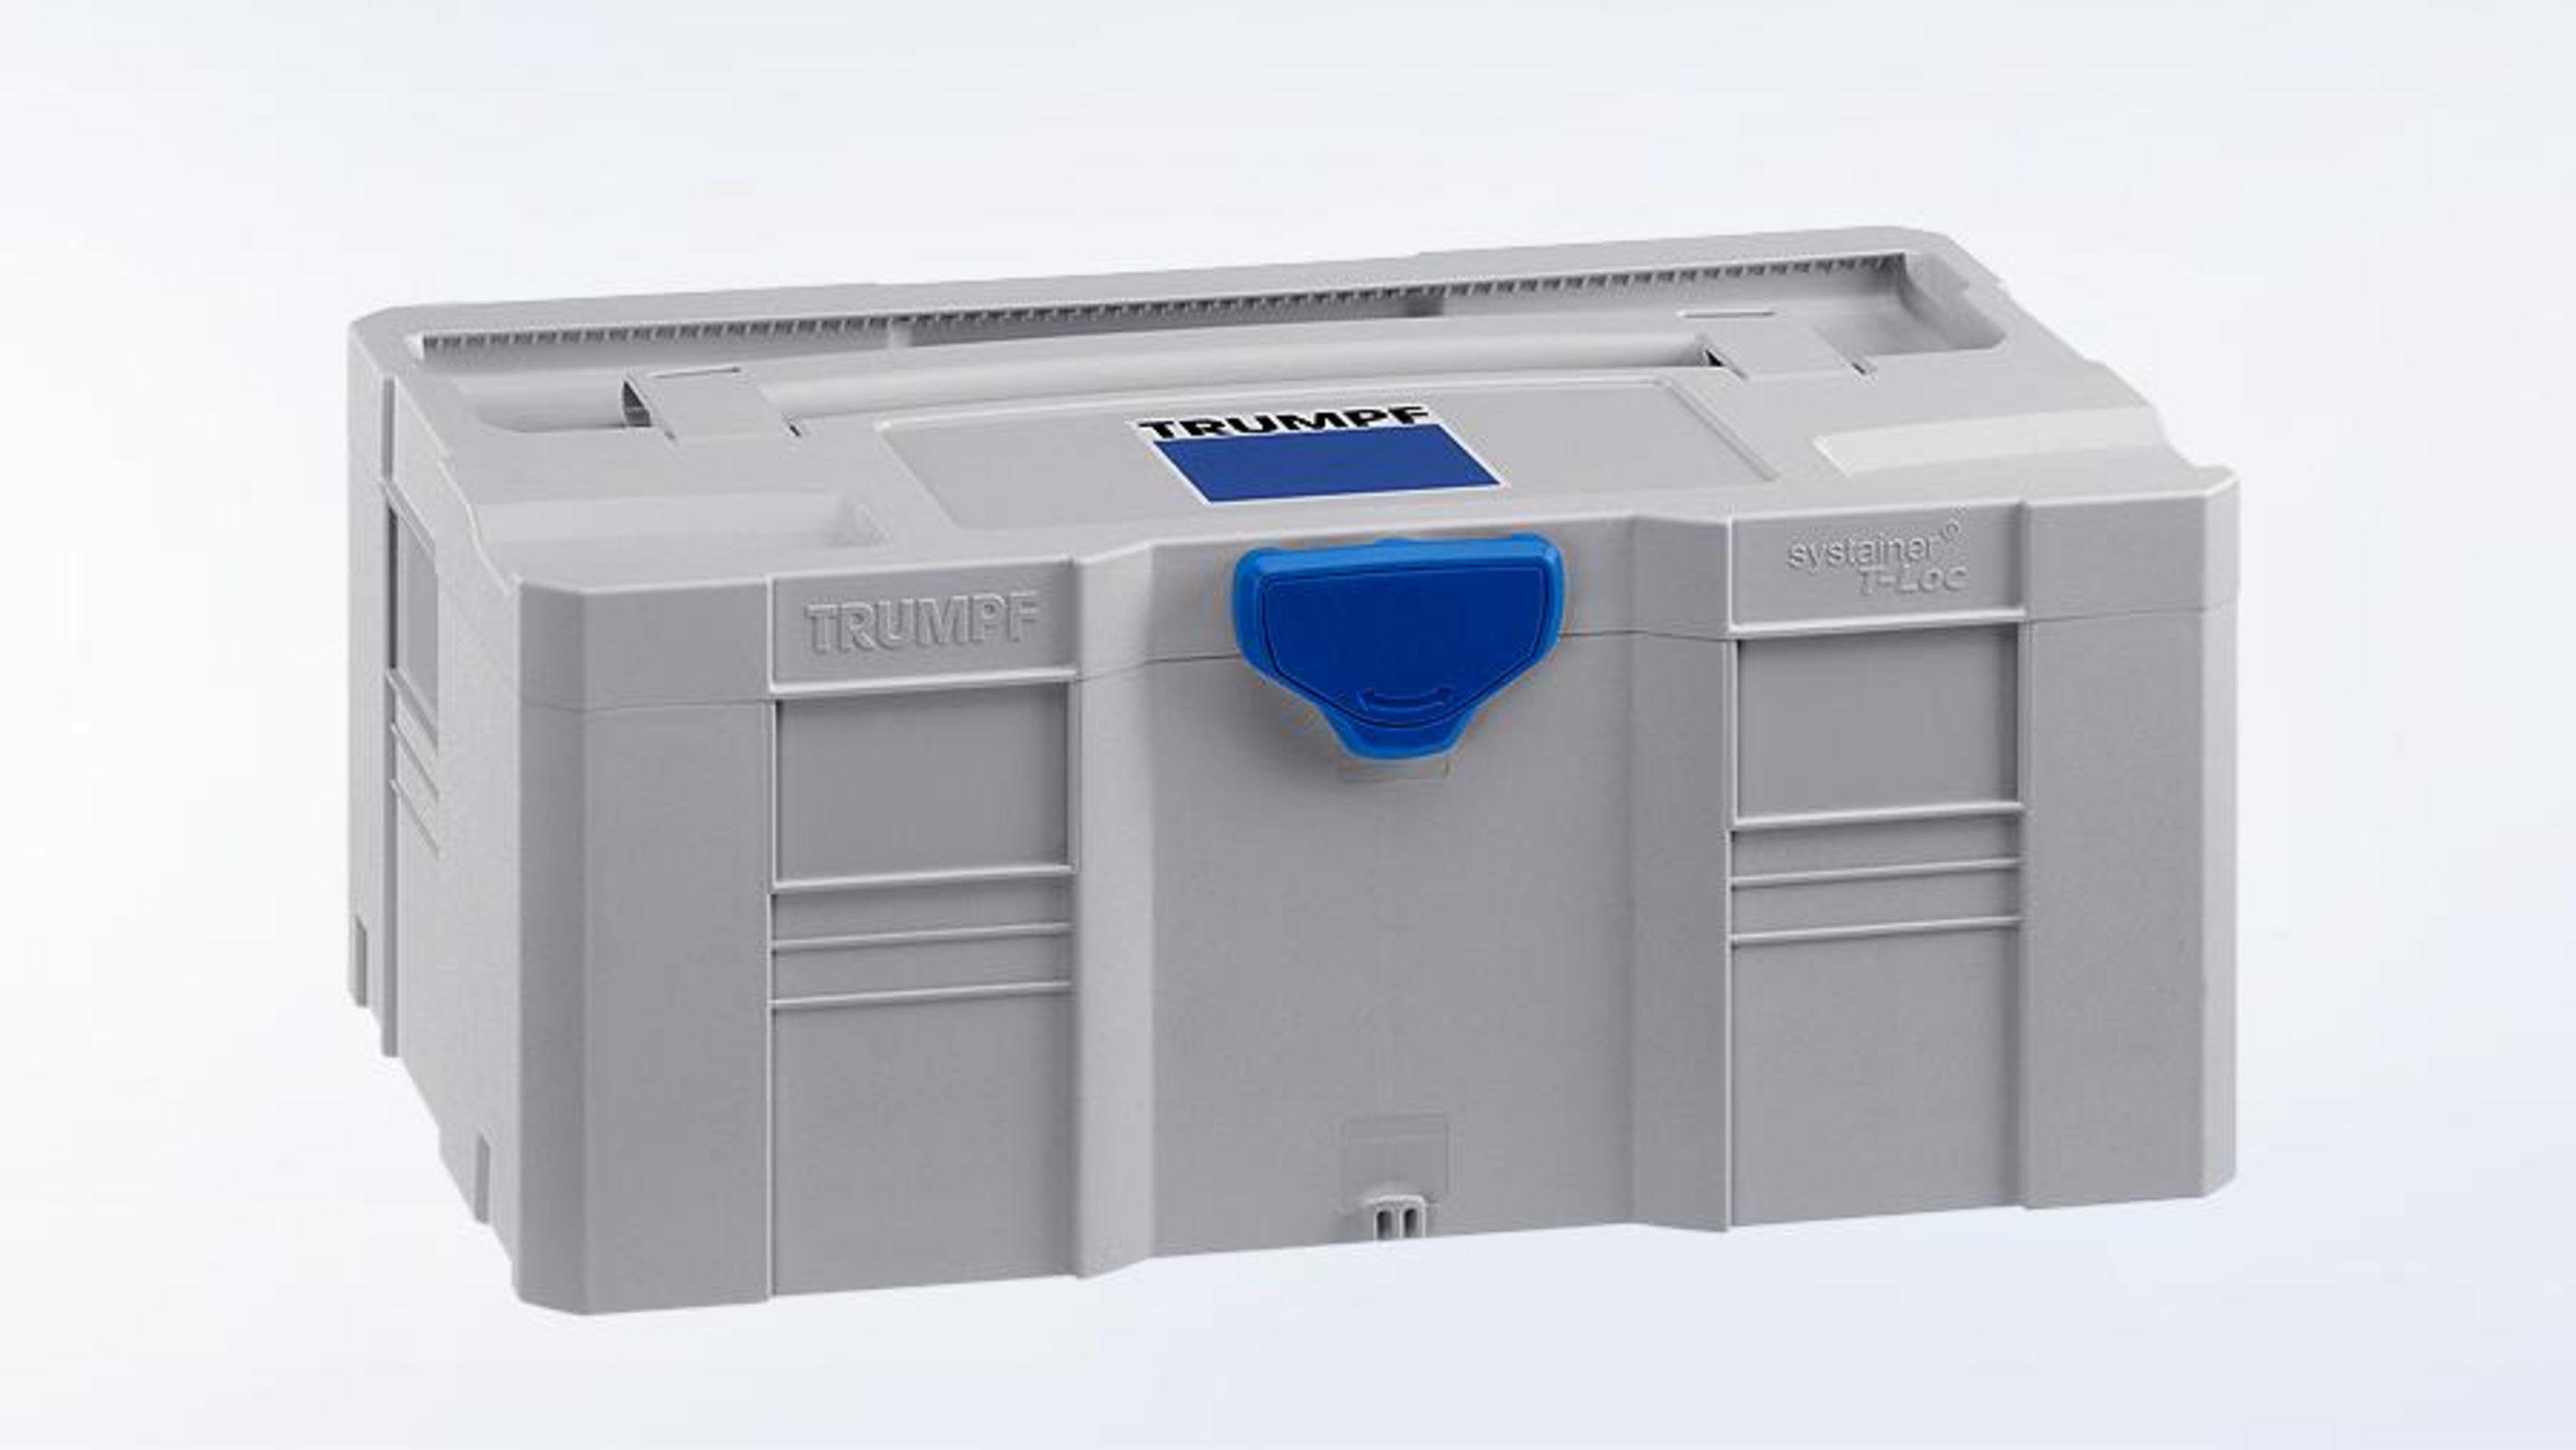 TRUMPF Box M3